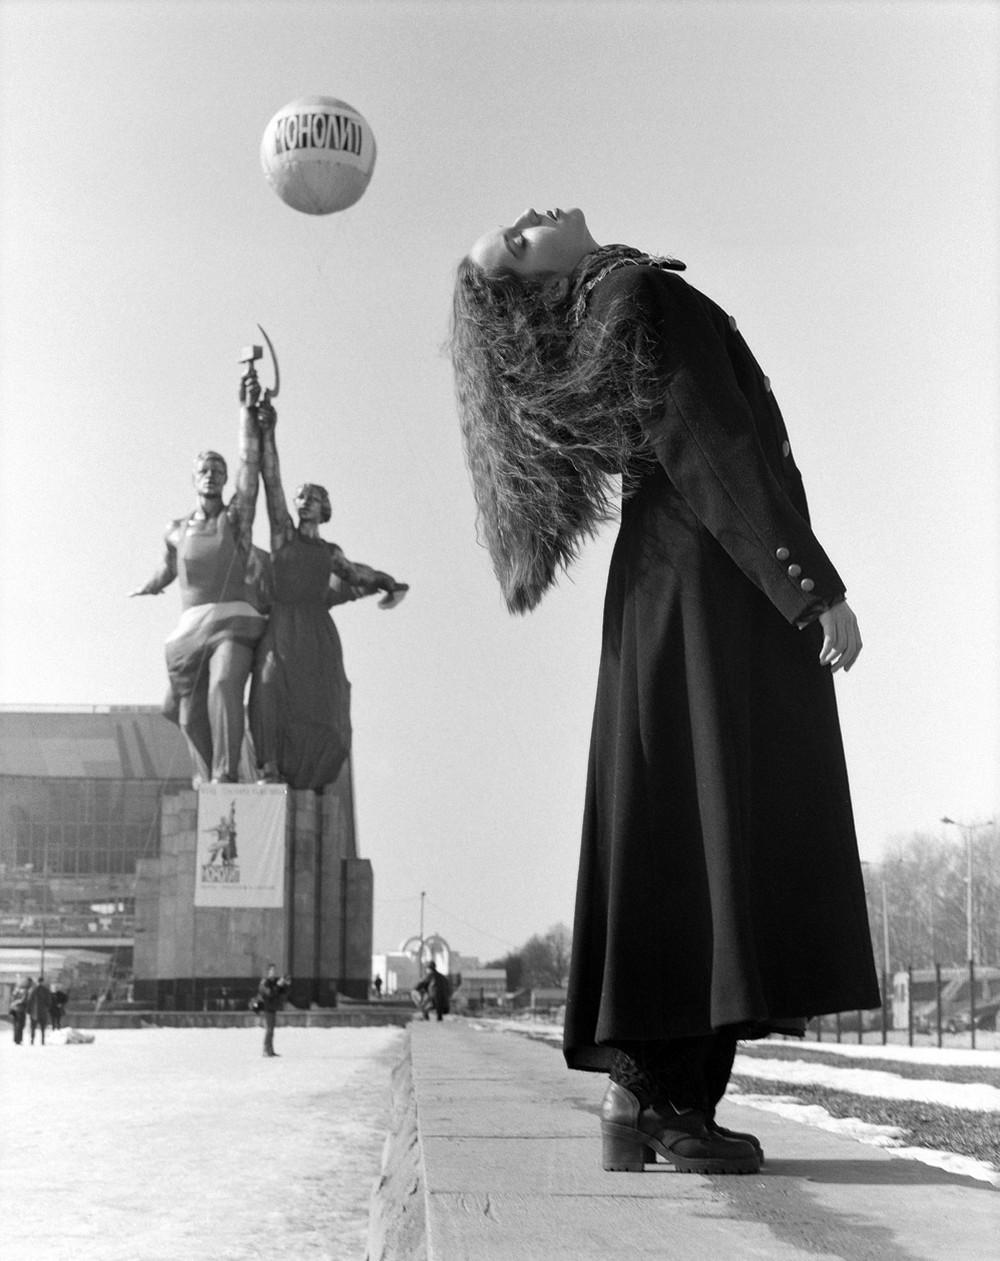 fotograf Sergey Borisov 35